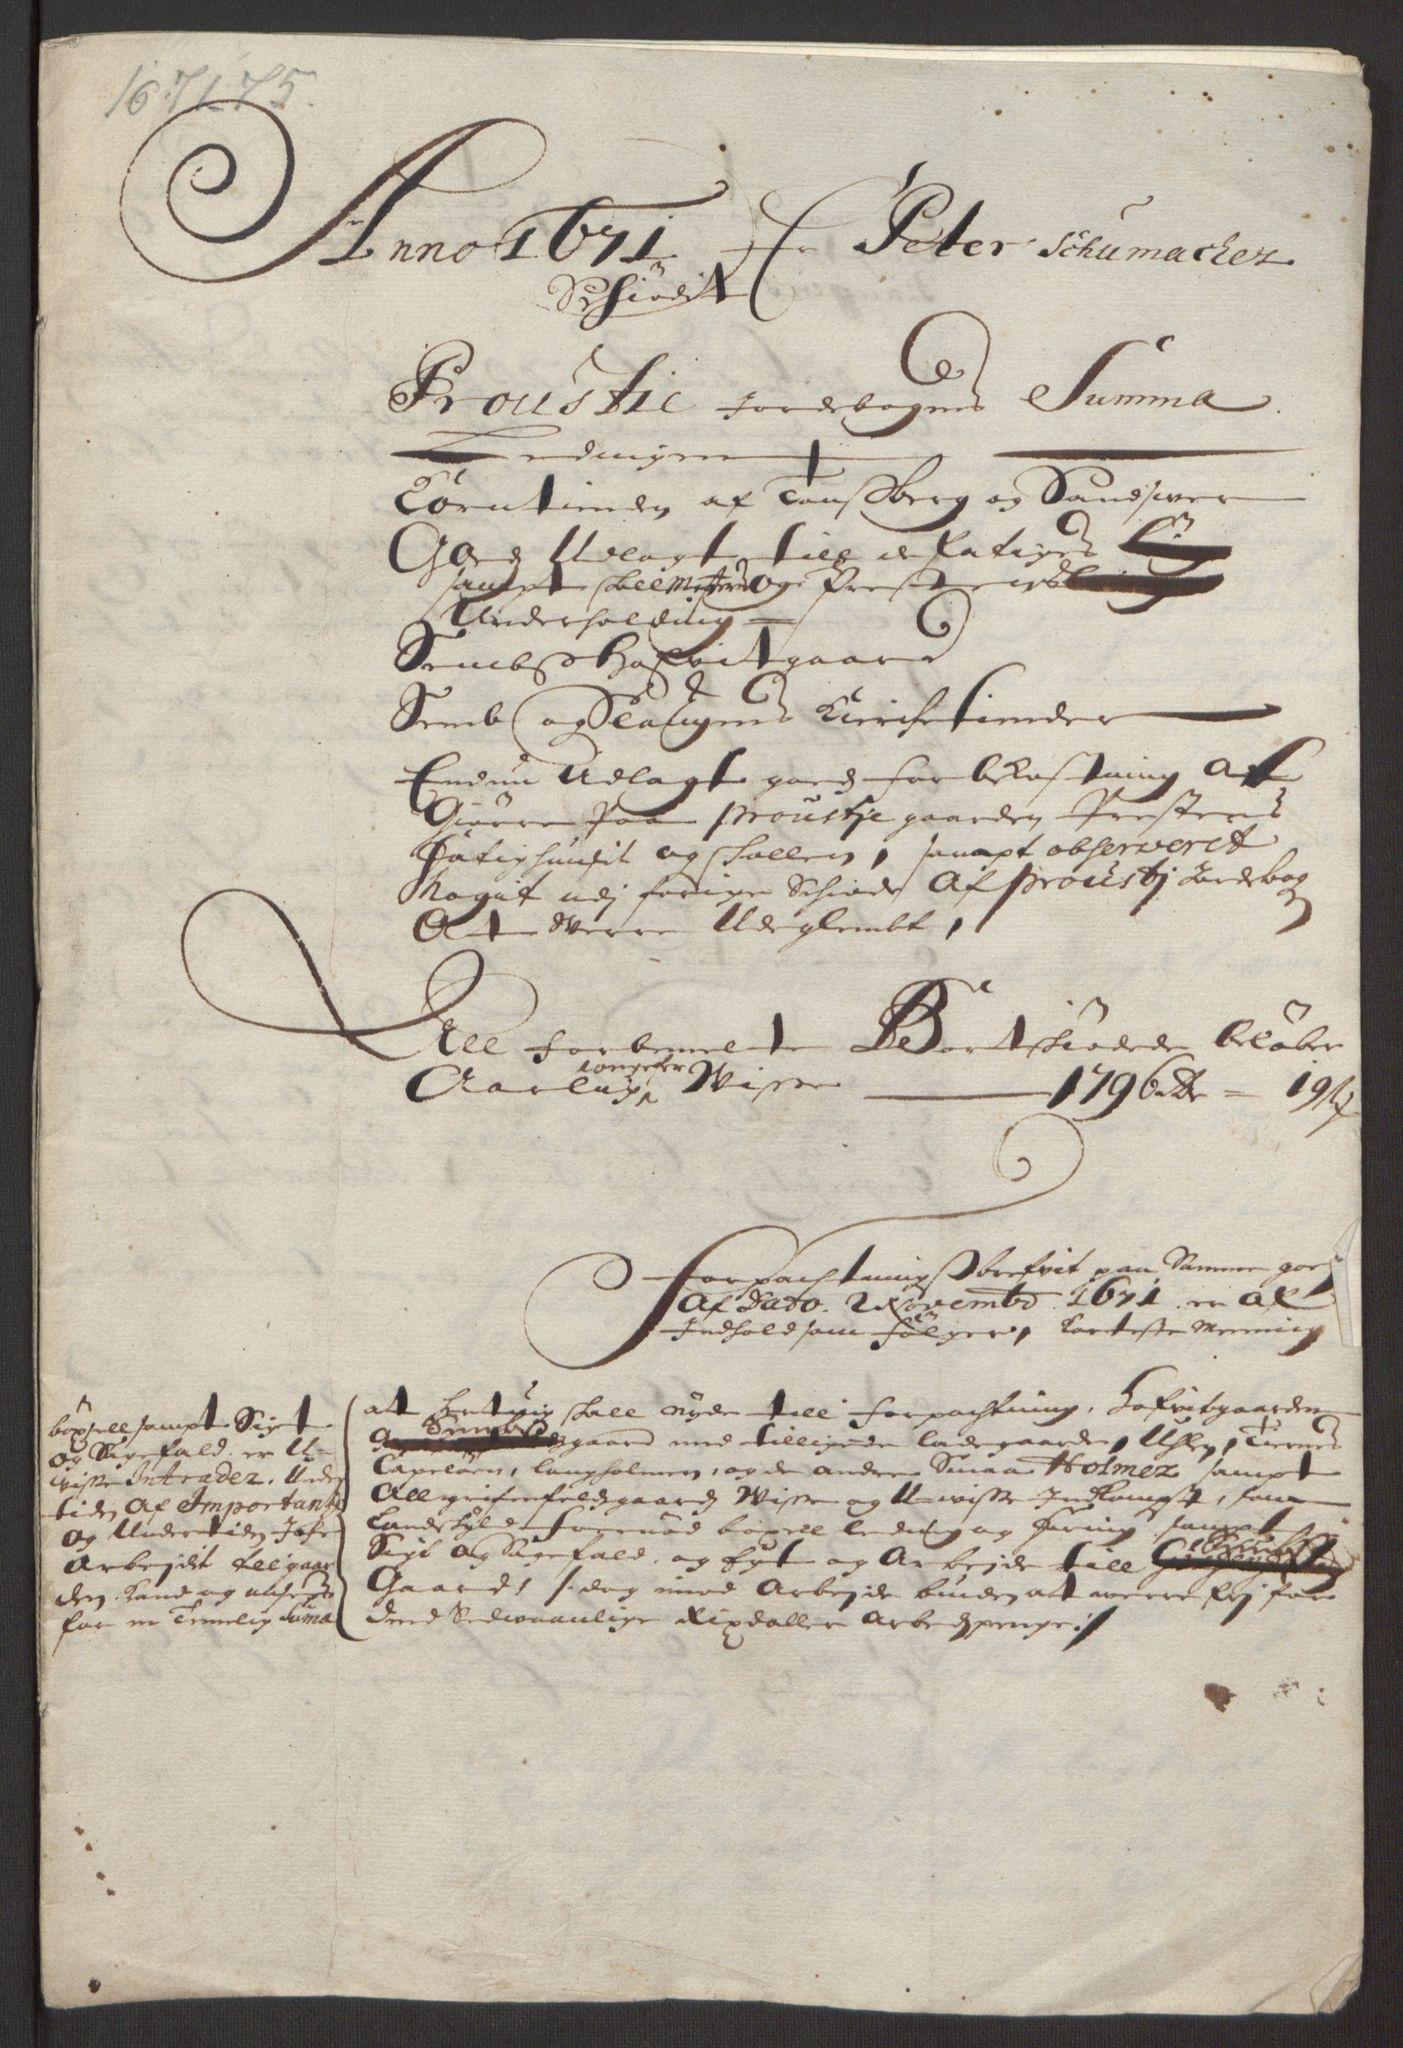 RA, Rentekammeret inntil 1814, Reviderte regnskaper, Fogderegnskap, R32/L1844: Fogderegnskap Jarlsberg grevskap, 1674-1675, s. 382